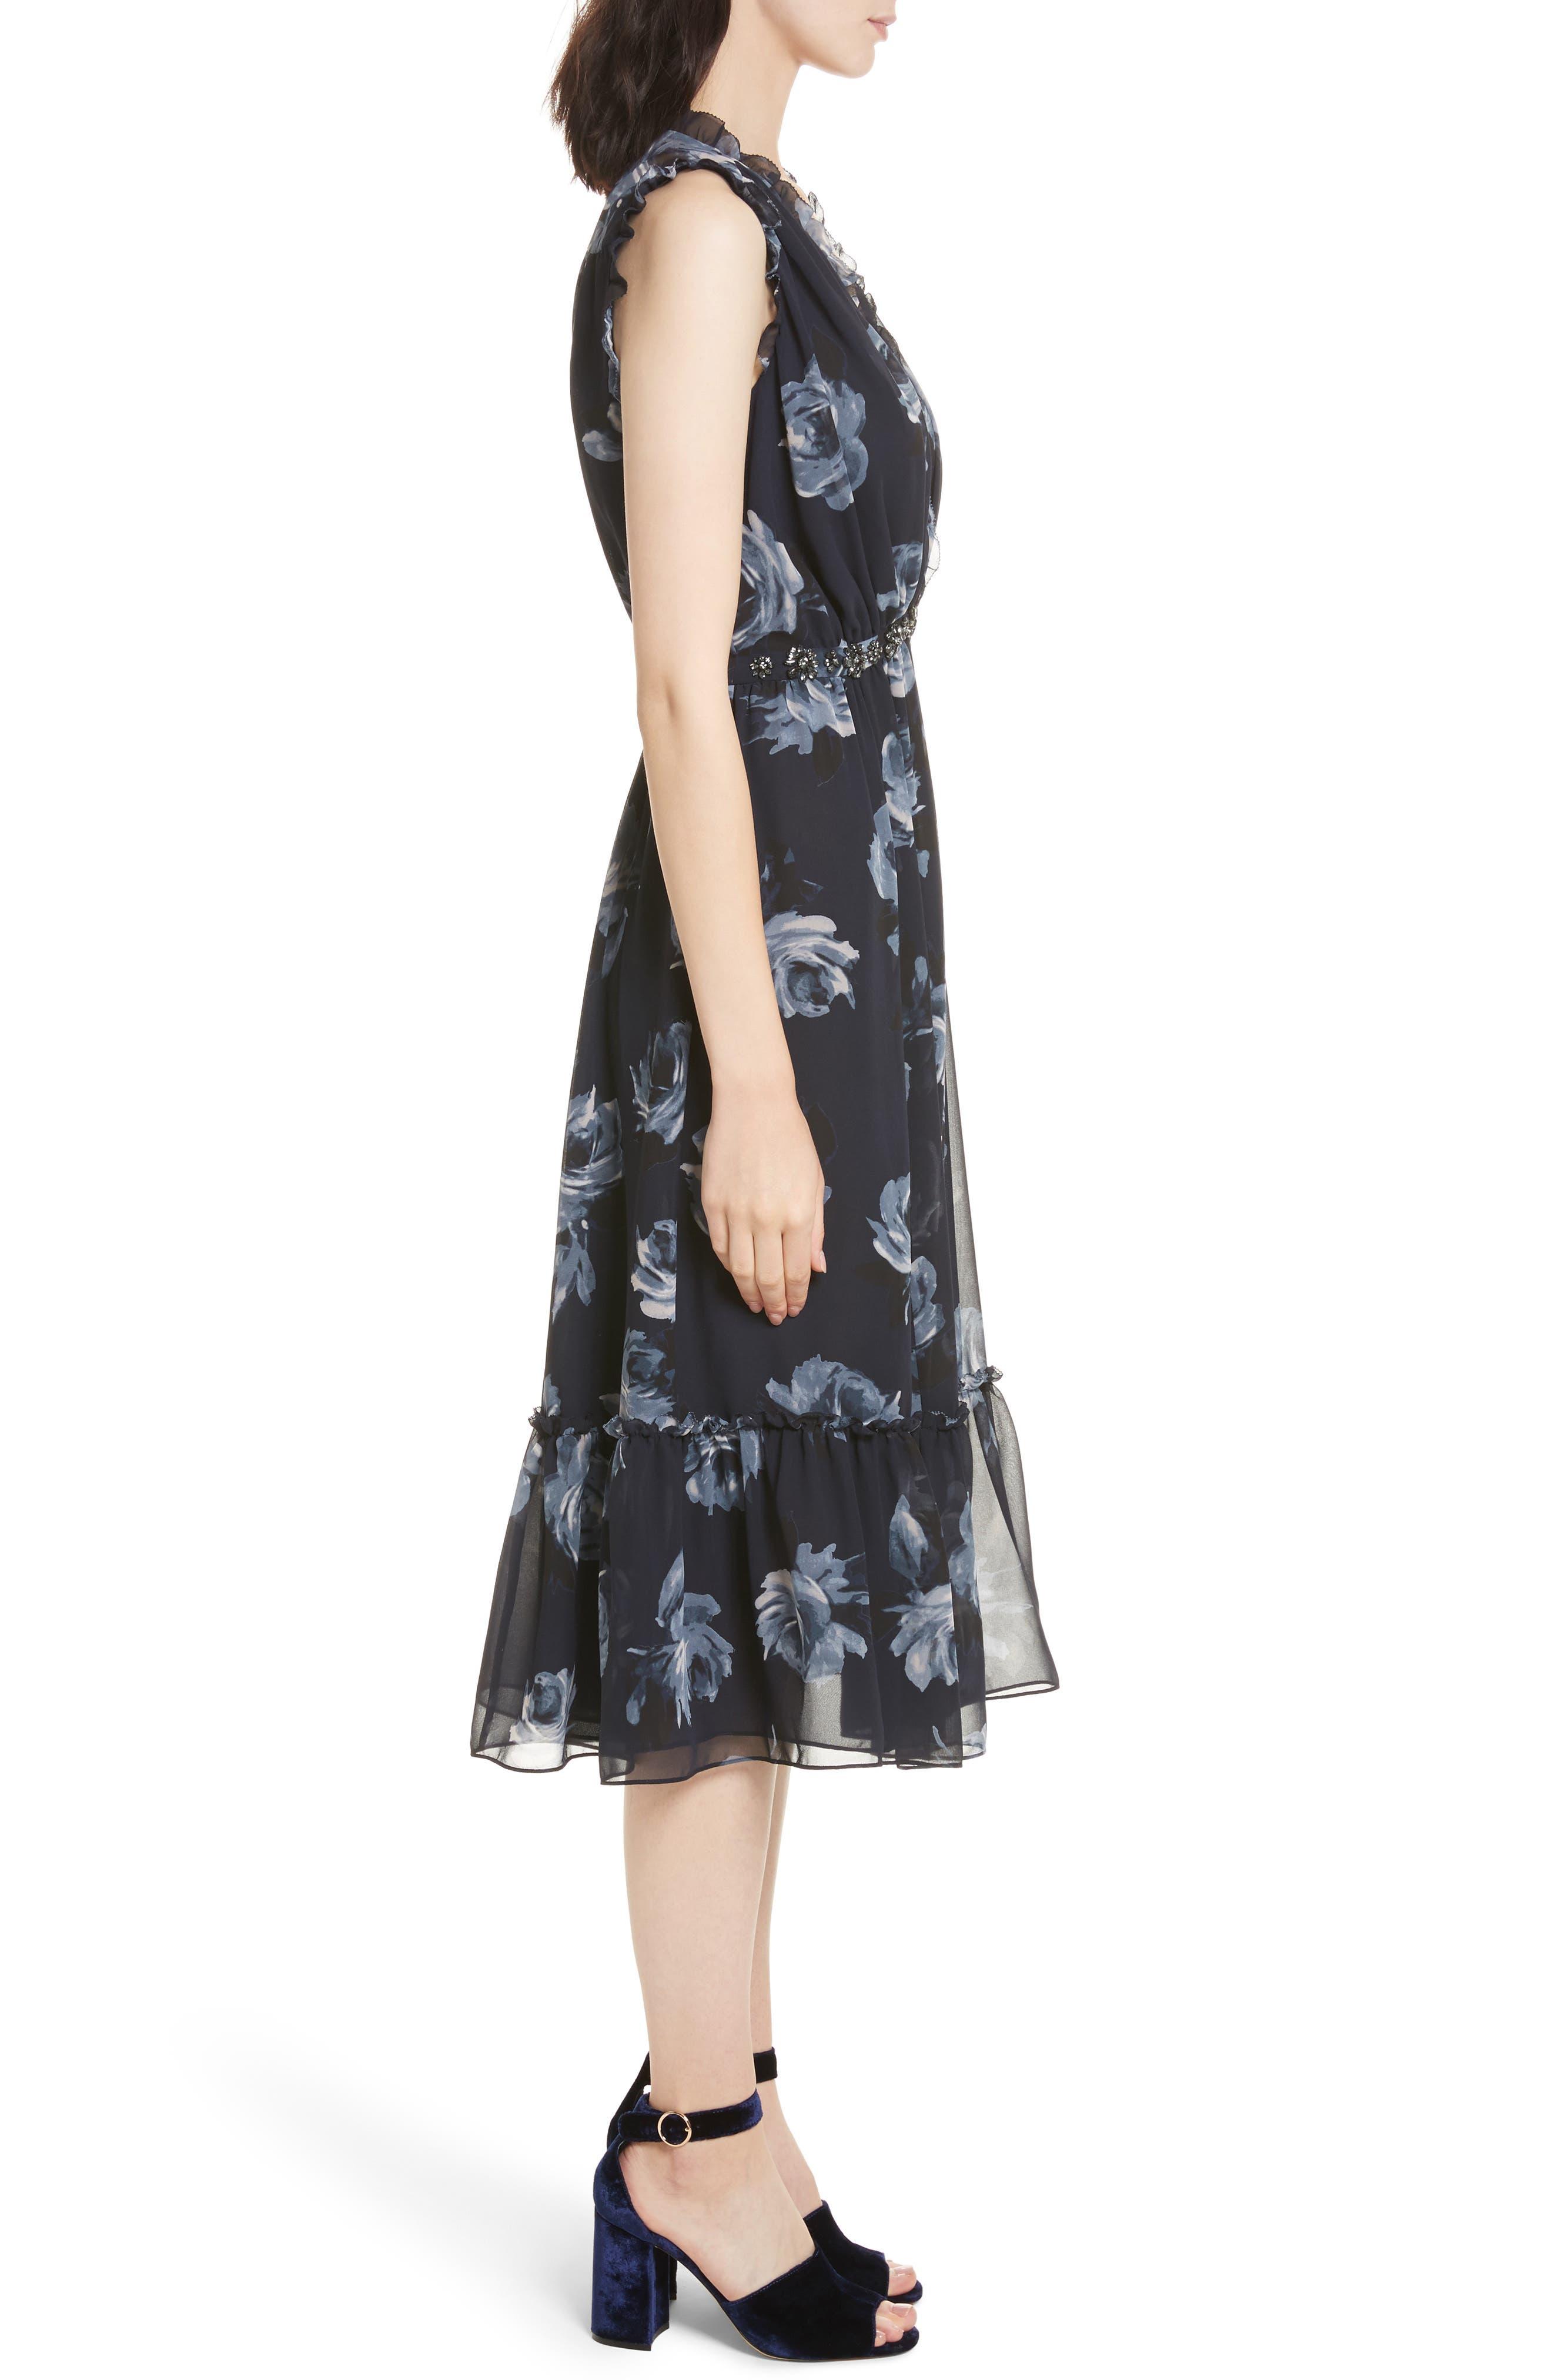 kade spade new york Night Rose Chiffon Midi Dress,                             Alternate thumbnail 3, color,                             473